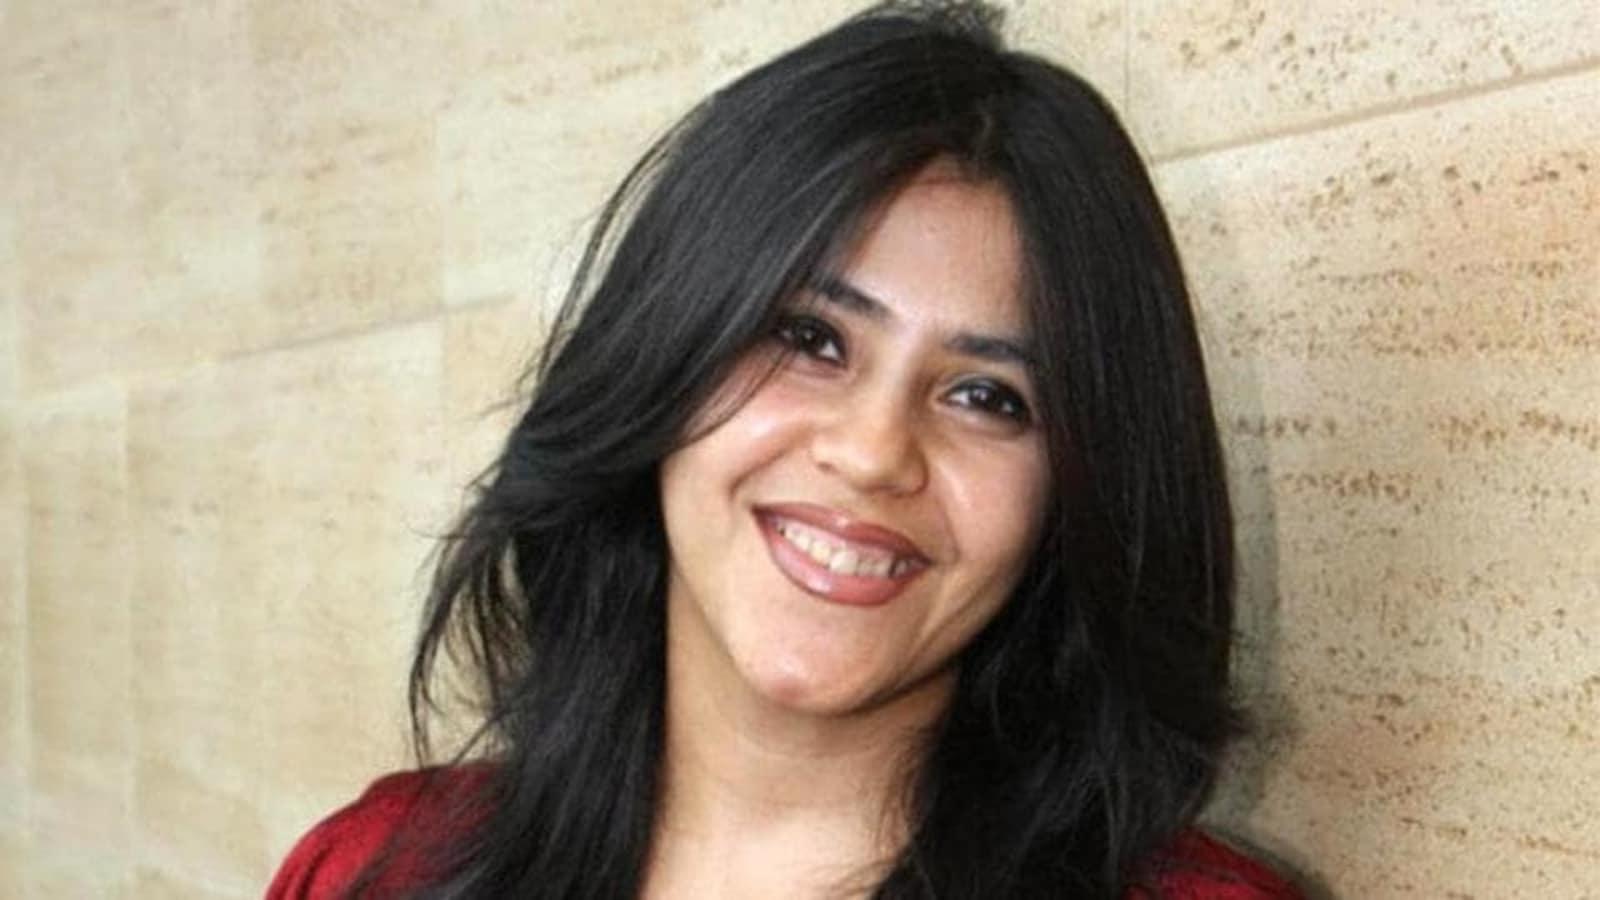 Balaji shareholders reject proposal to bump up Ekta Kapoor's ₹2.5 crore salary: report